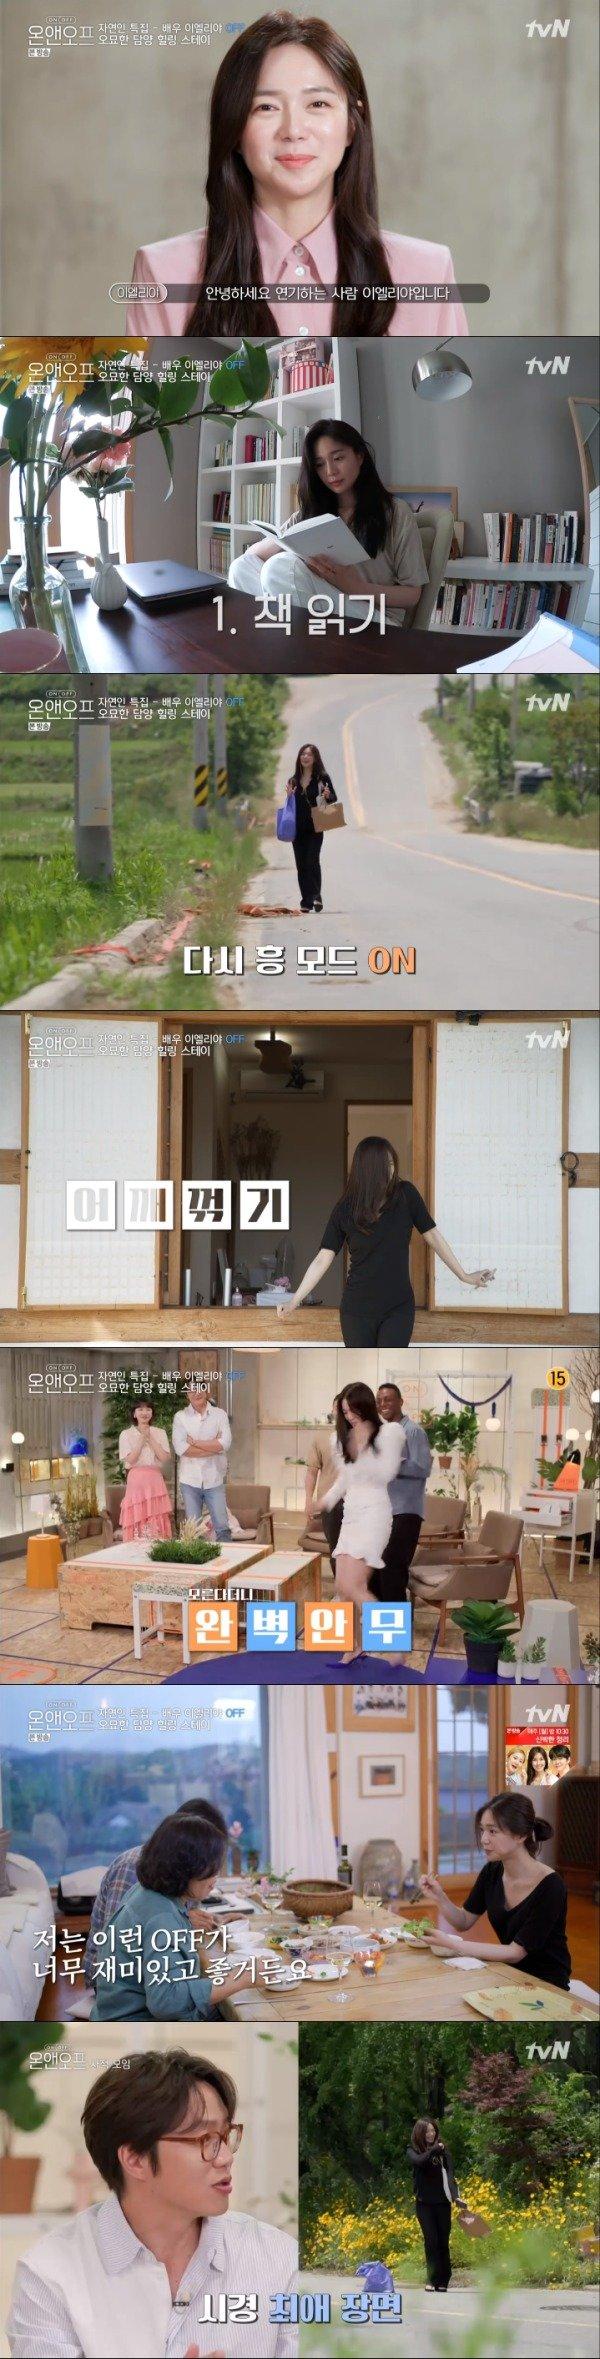 tvN '온앤오프' 방송 화면 캡처 © 뉴스1